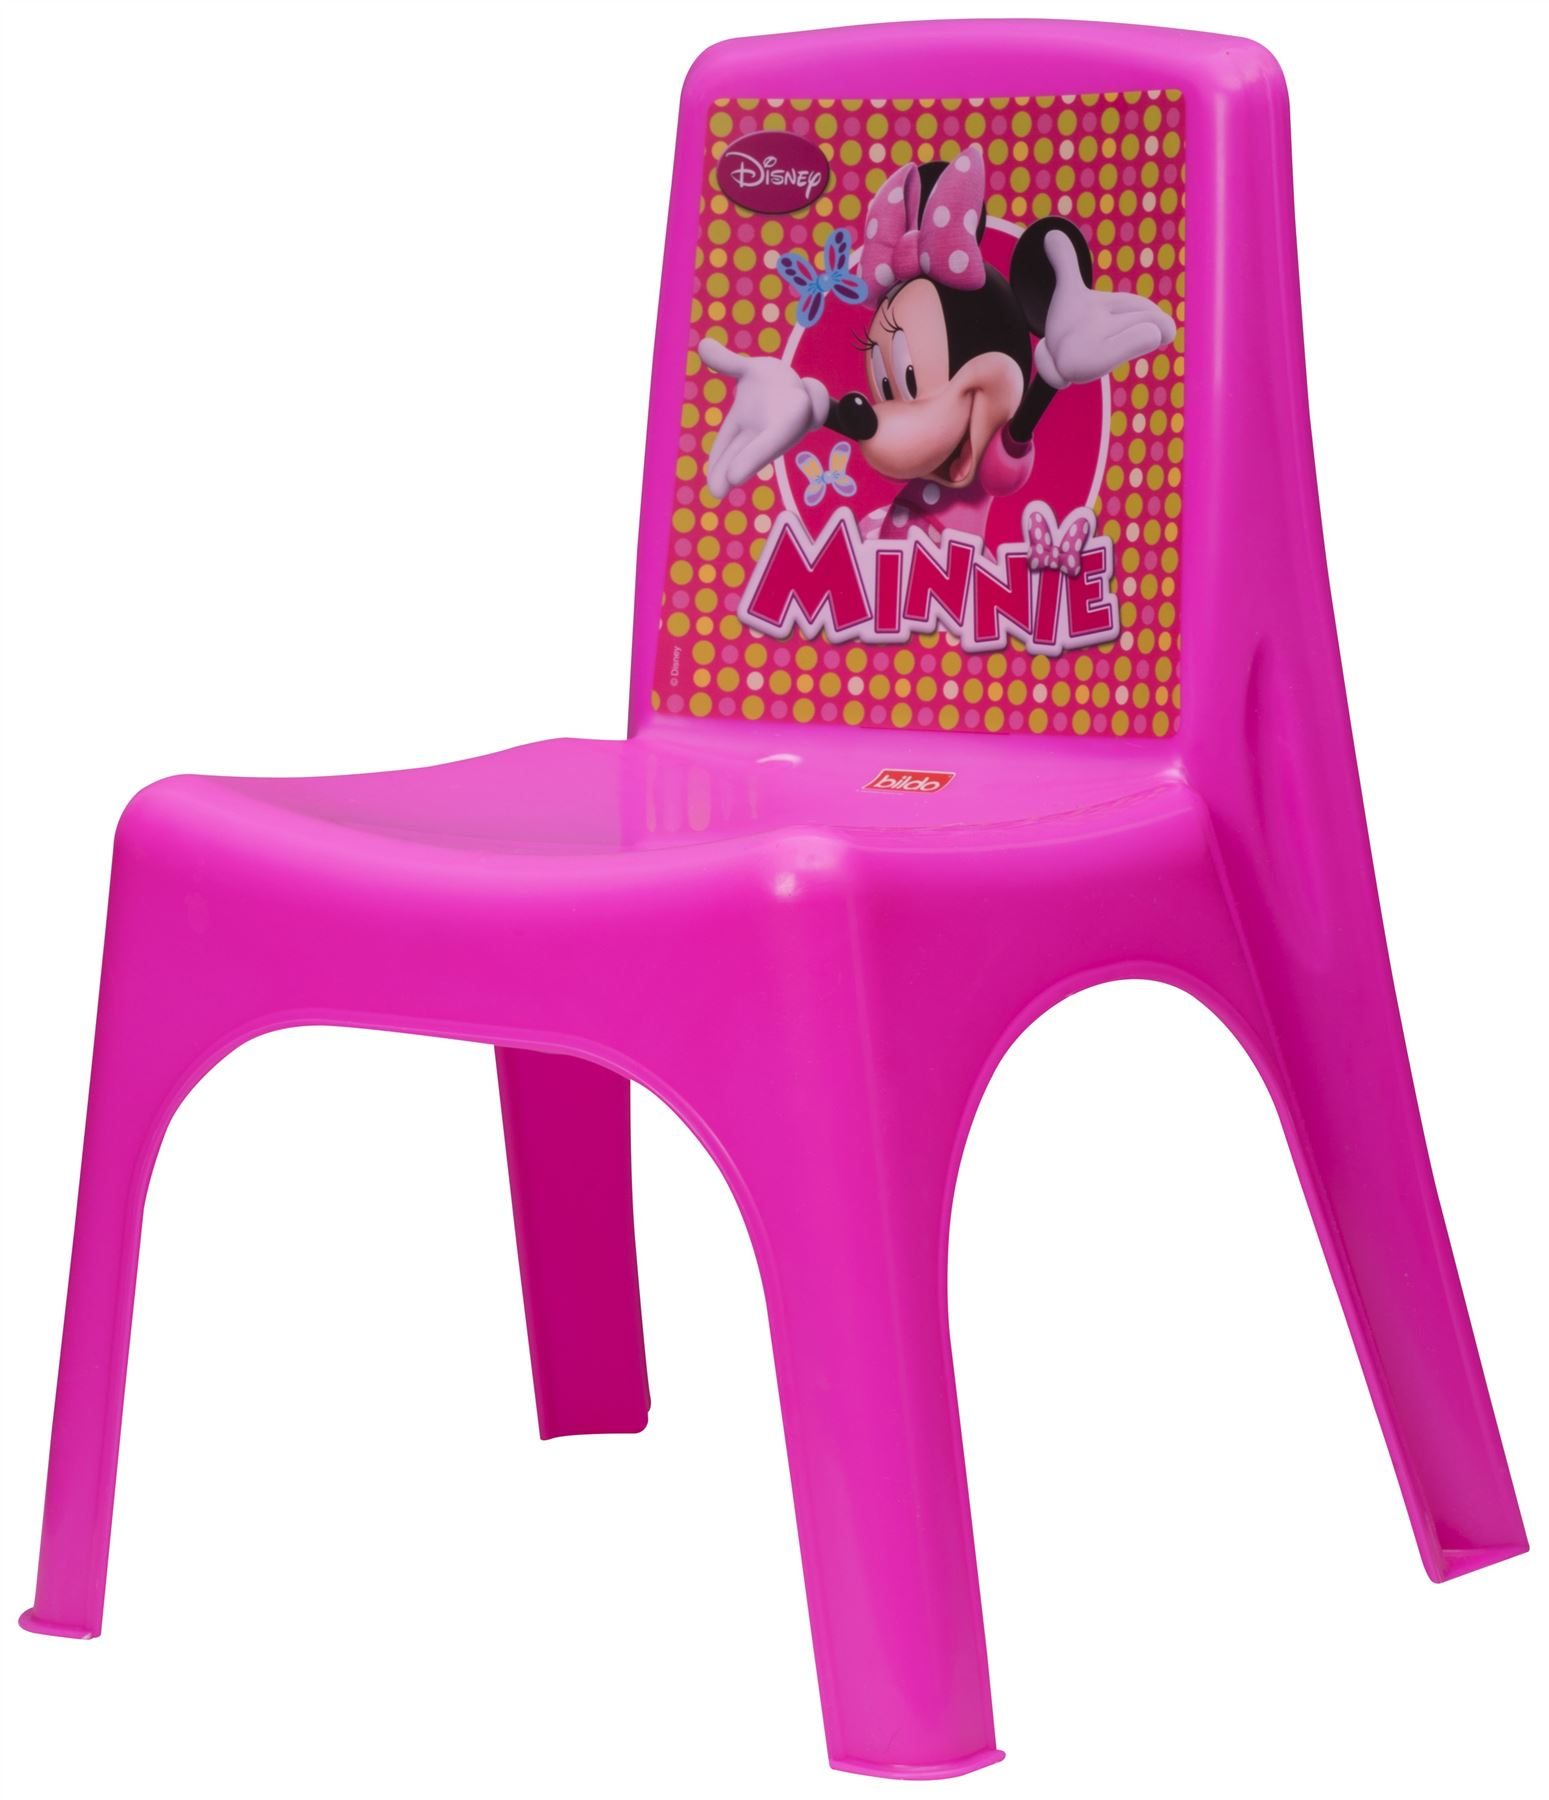 Disney minnie mouse chair frozen kitchen tea set beauty set toy girls gift new ebay - Fauteuil club minnie de disney ...